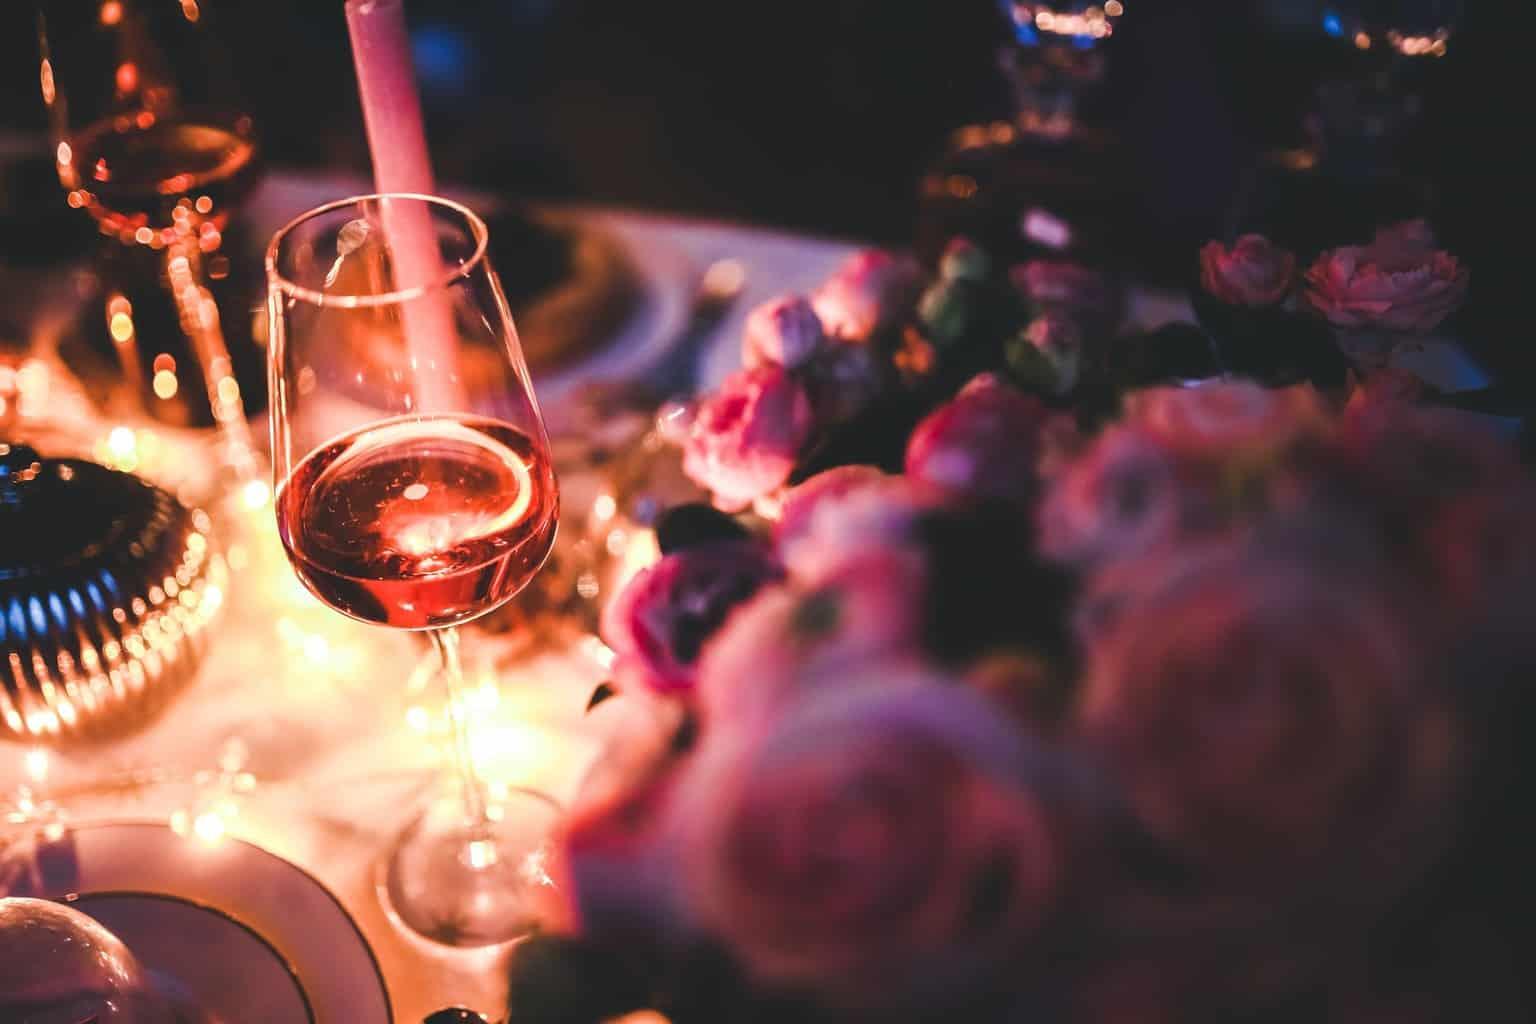 Romantic Meal